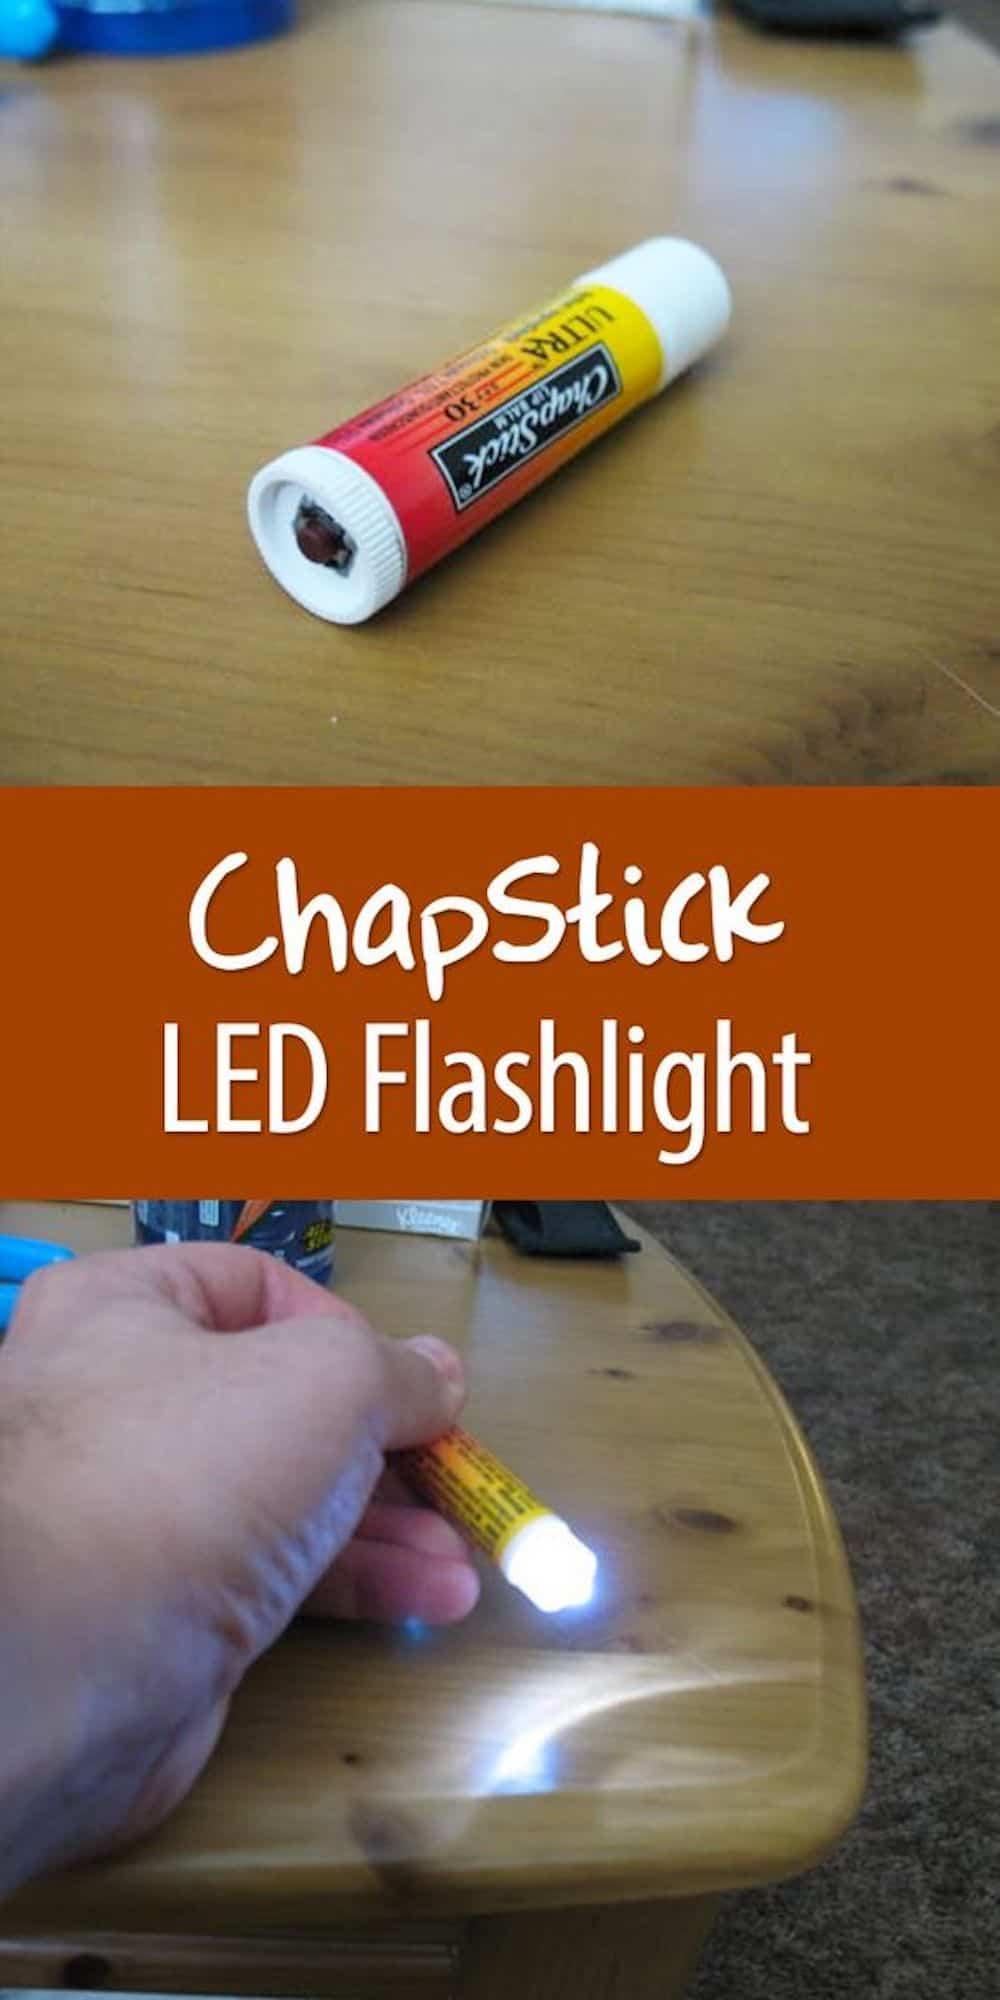 Chapstick Flashlight